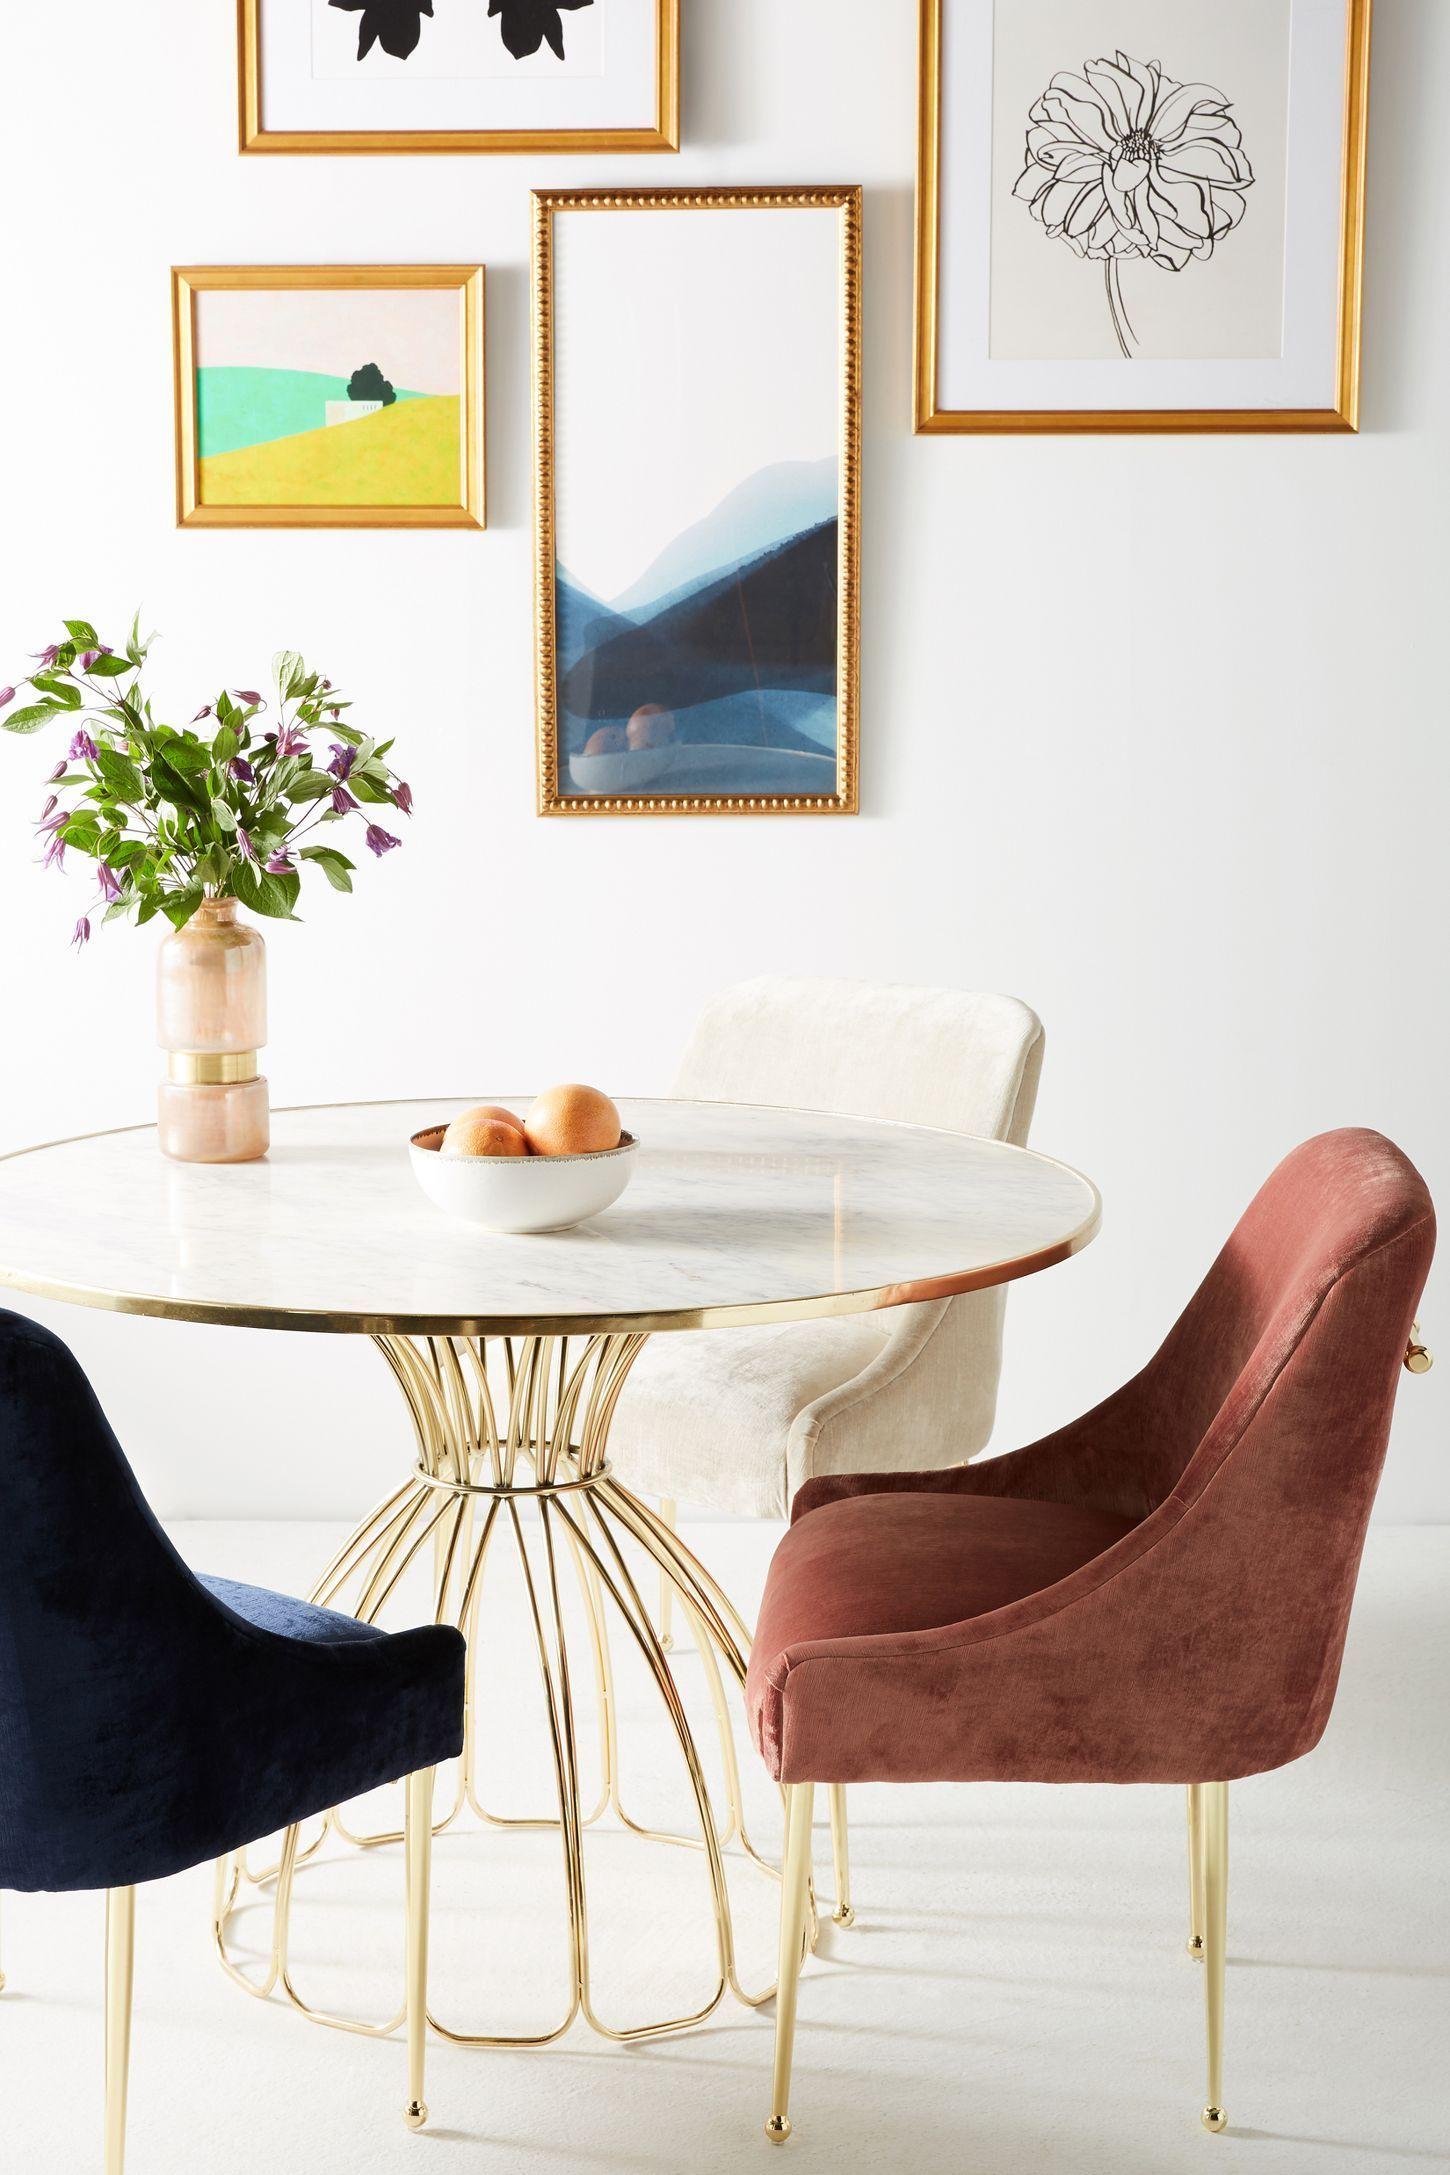 Furniture Impressive Designerurniture Image Ideas Chicago Wabash Marblealls Texas Nycdesigner Martabrics 88 Designer